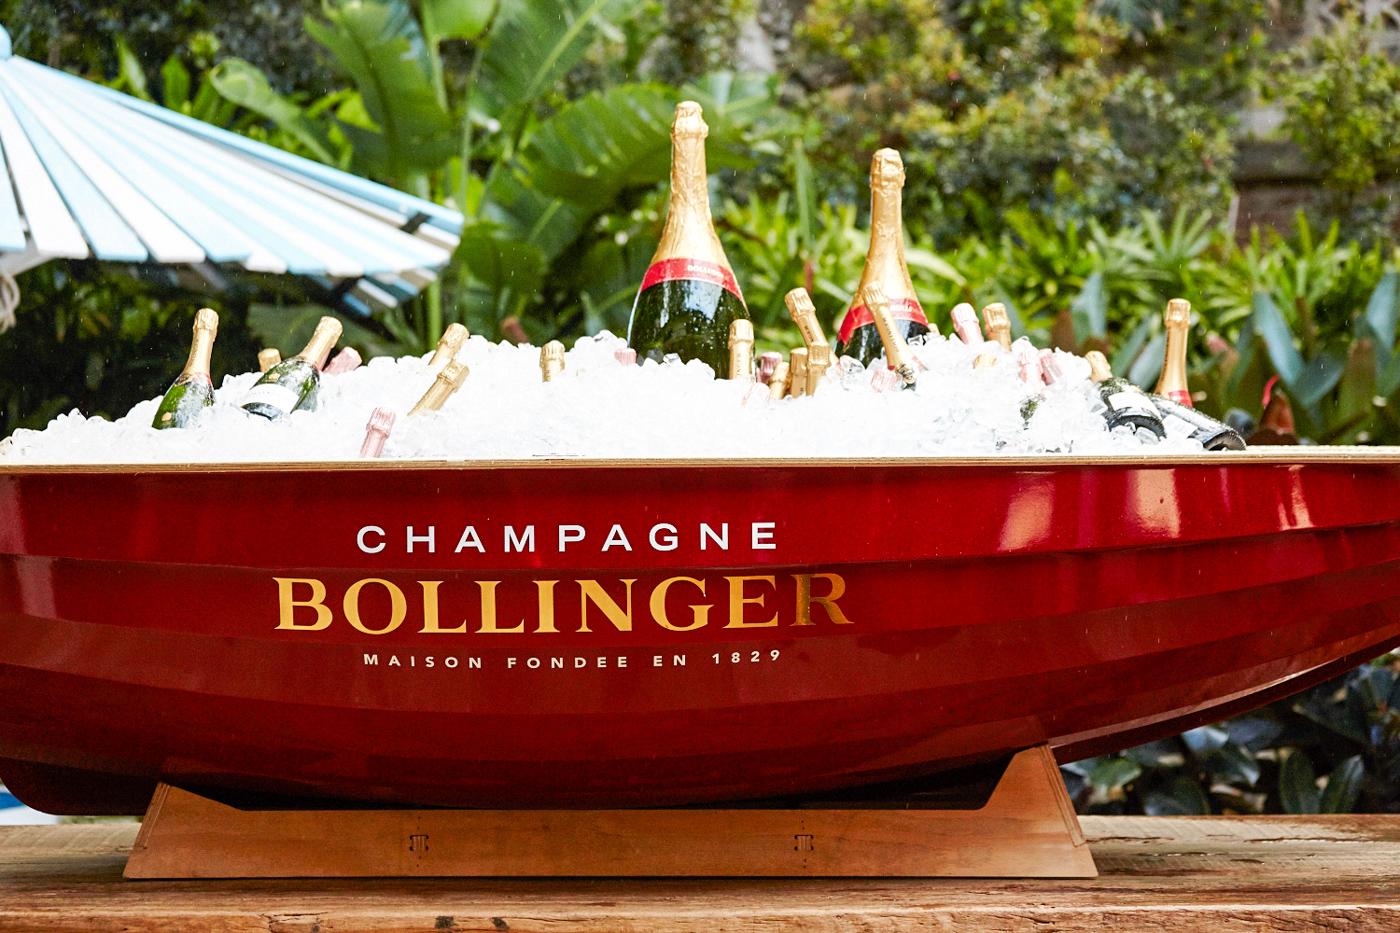 1612_BollingerBoats-2.jpg